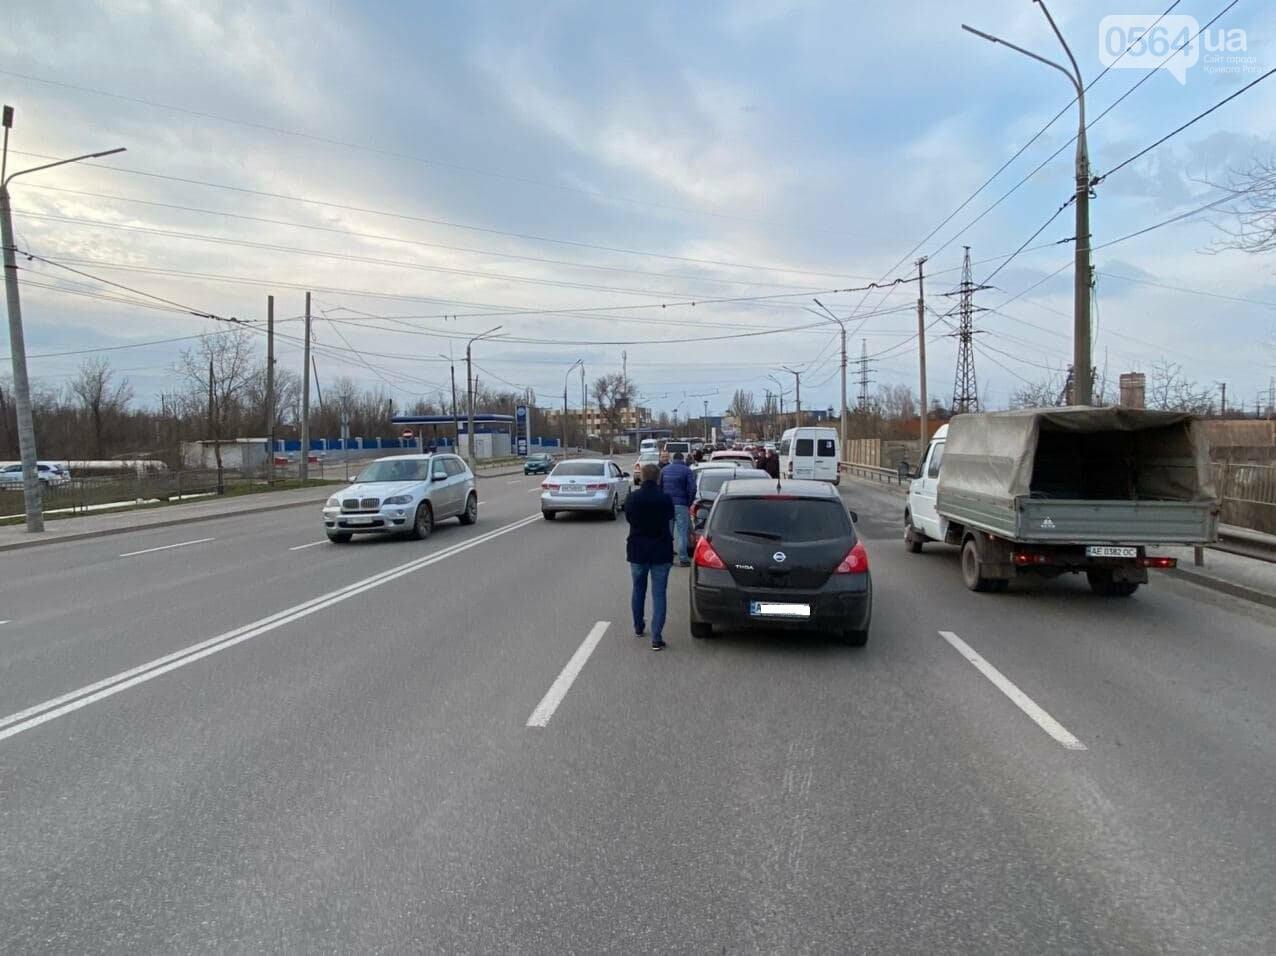 5 машин разбились в ДТП в Кривом Роге, - ФОТО, фото-9